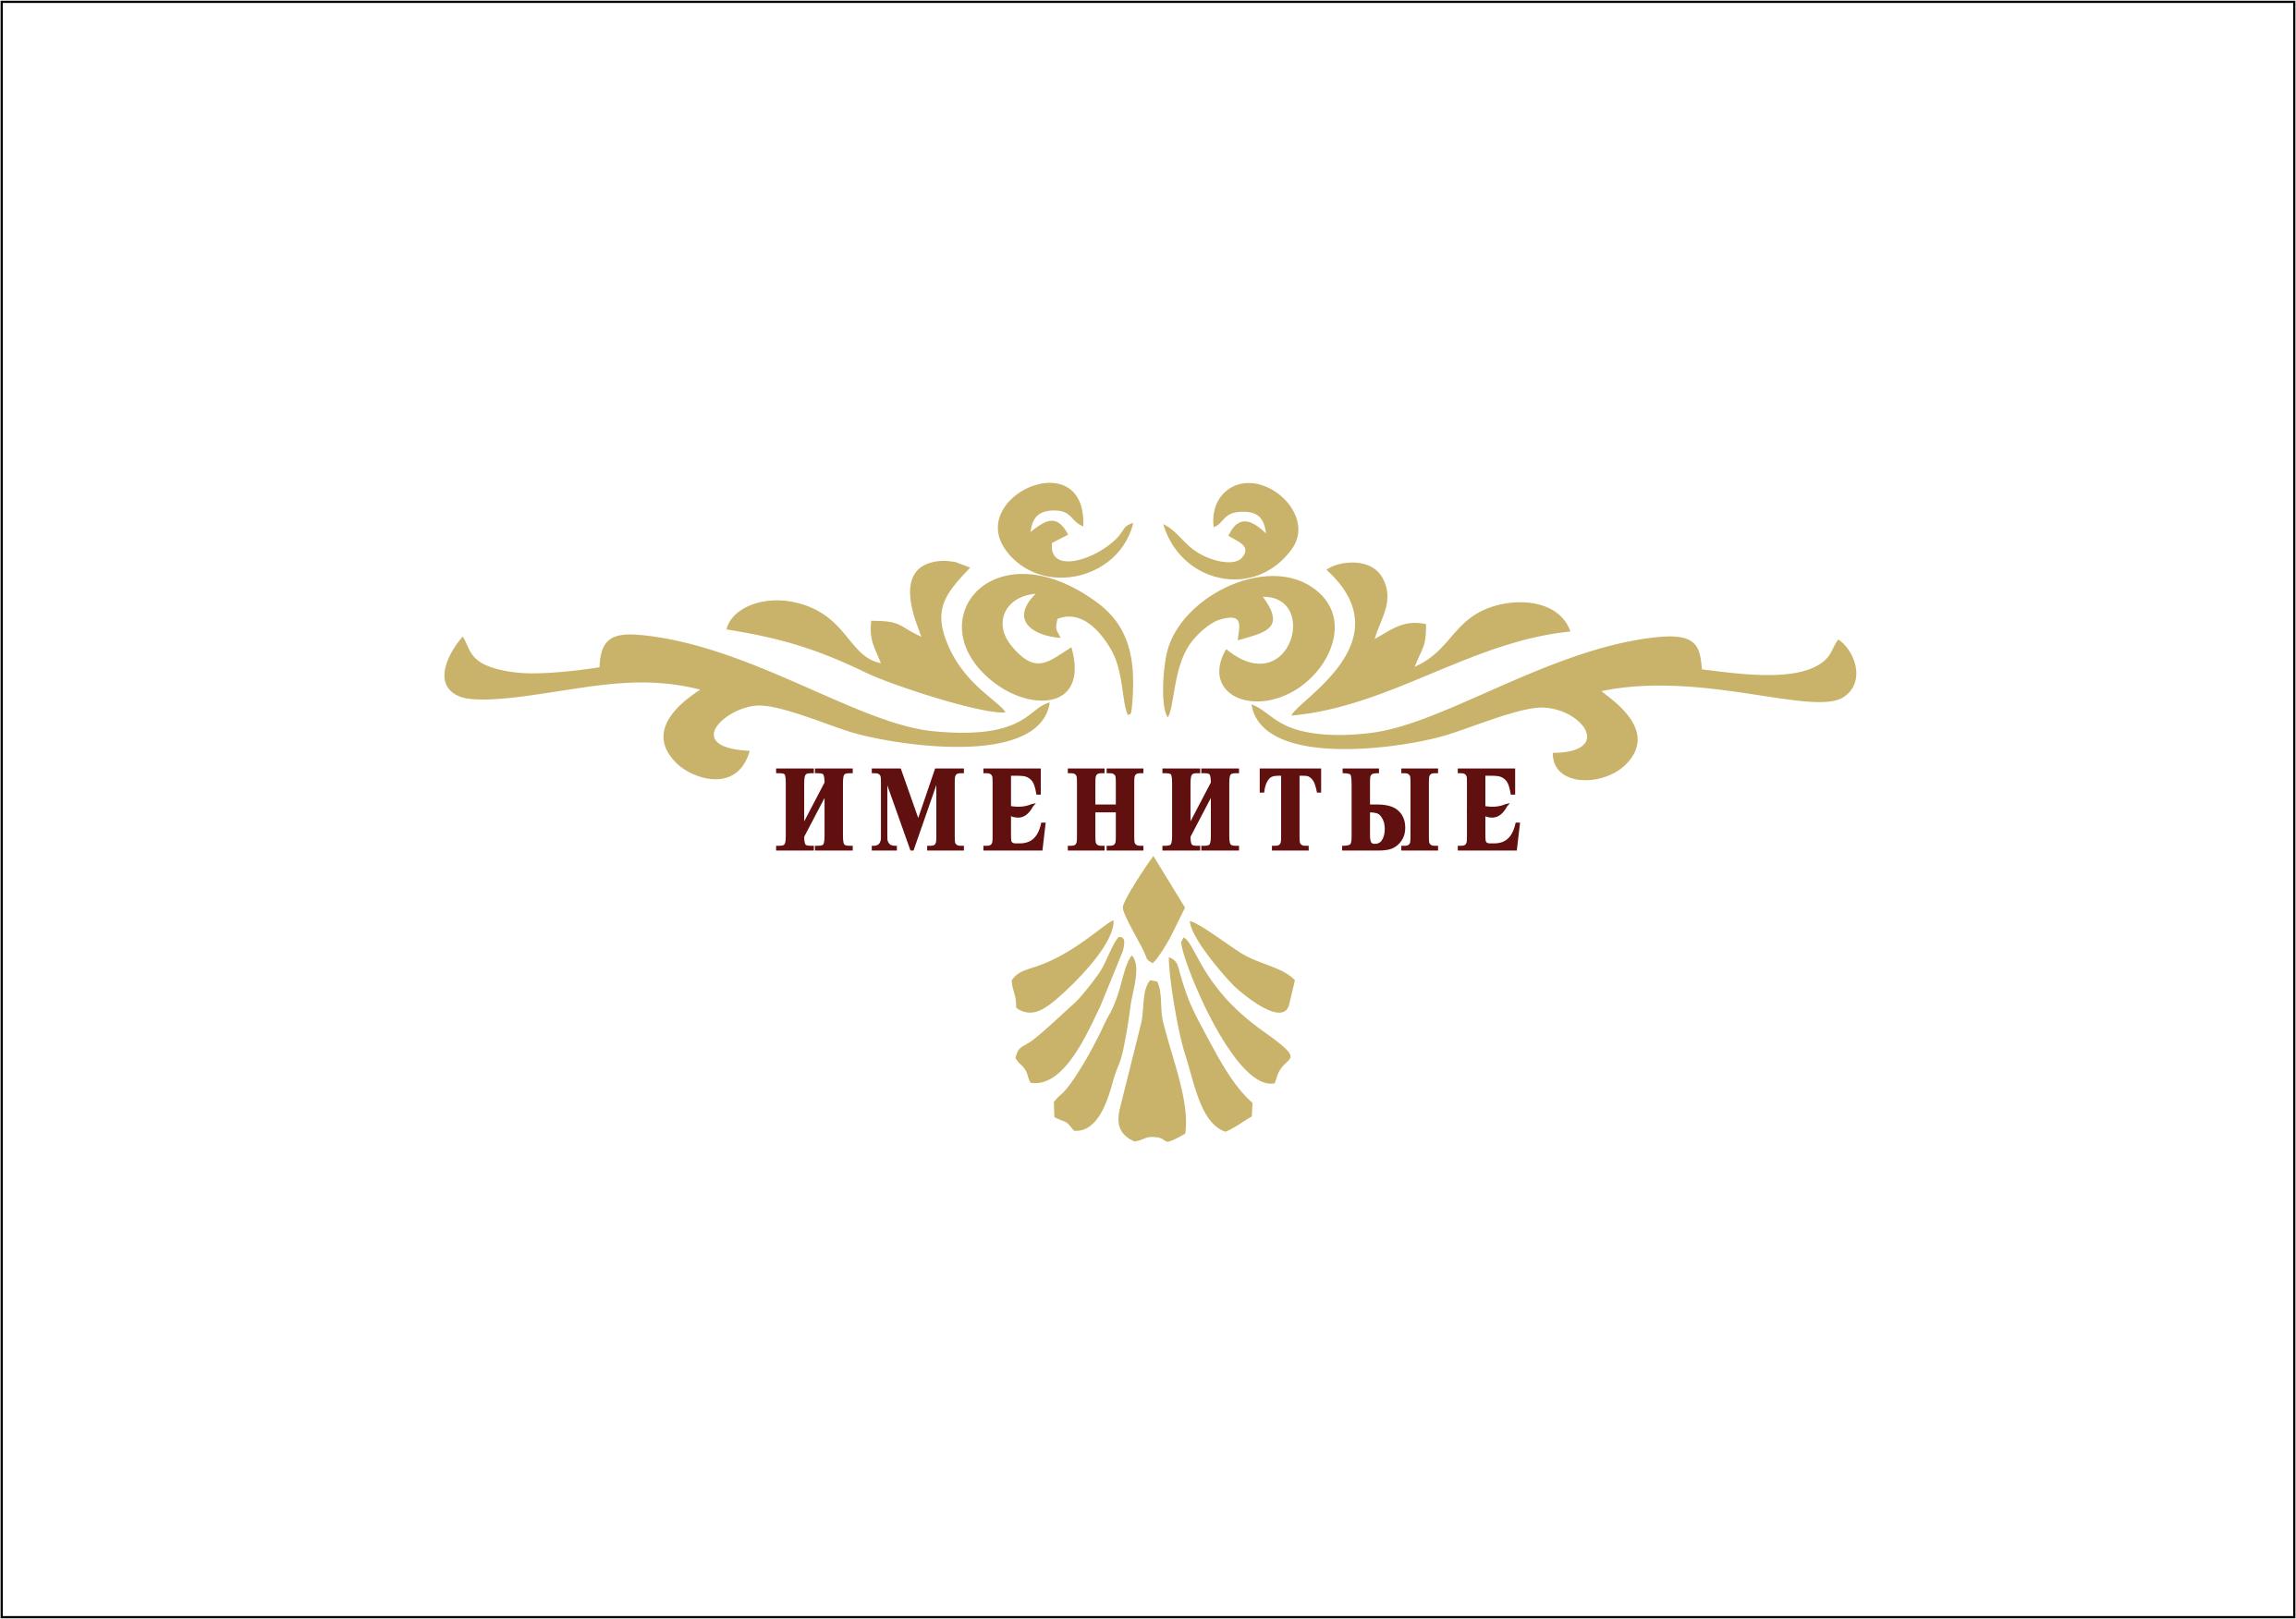 Логотип и фирменный стиль продуктов питания фото f_7515bc3be7b12297.png